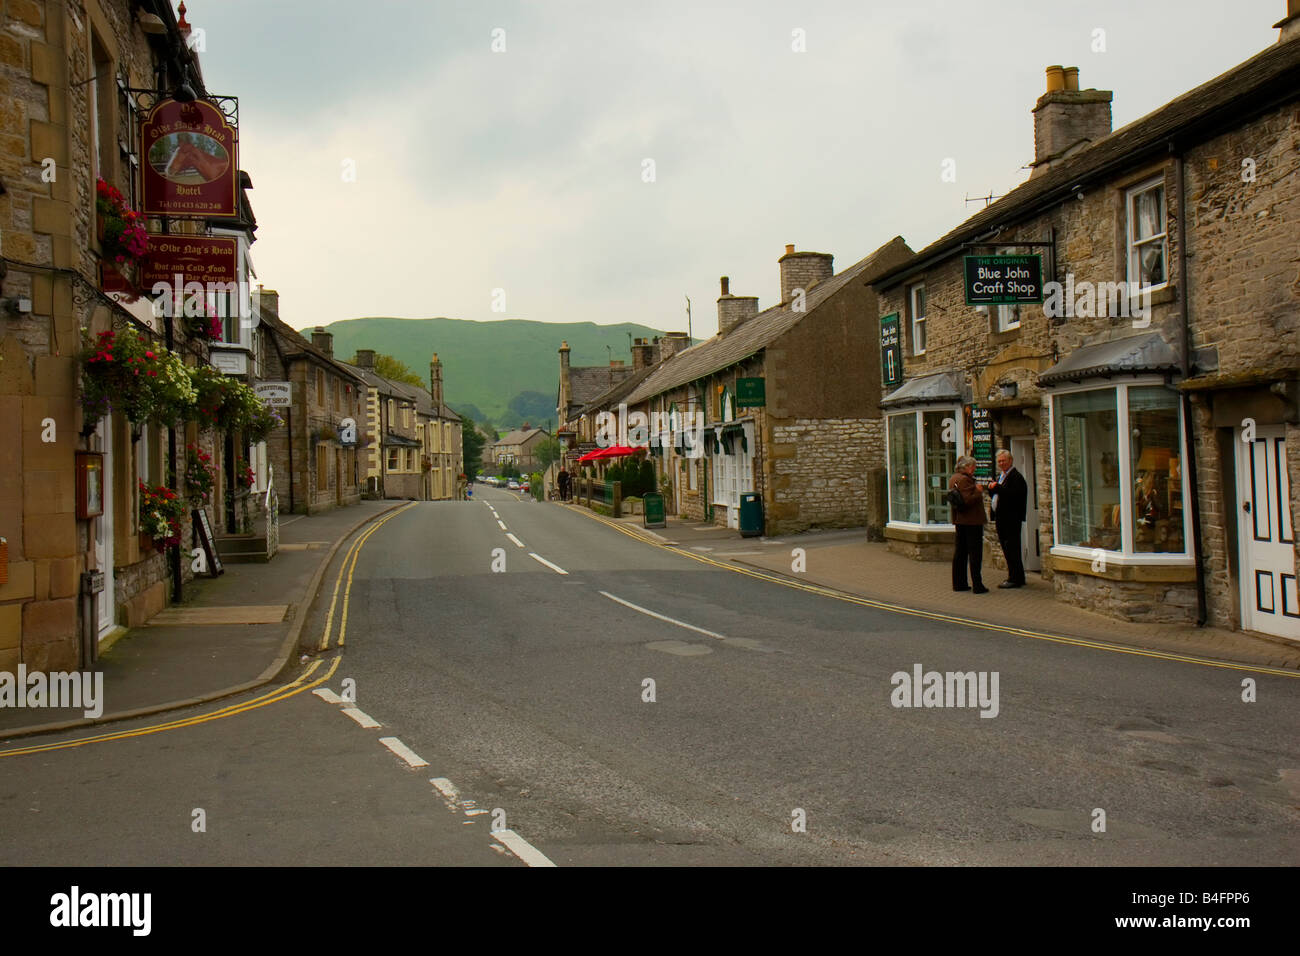 The Main street in Castle village Derbyshire Peak District September 2008 - Stock Image